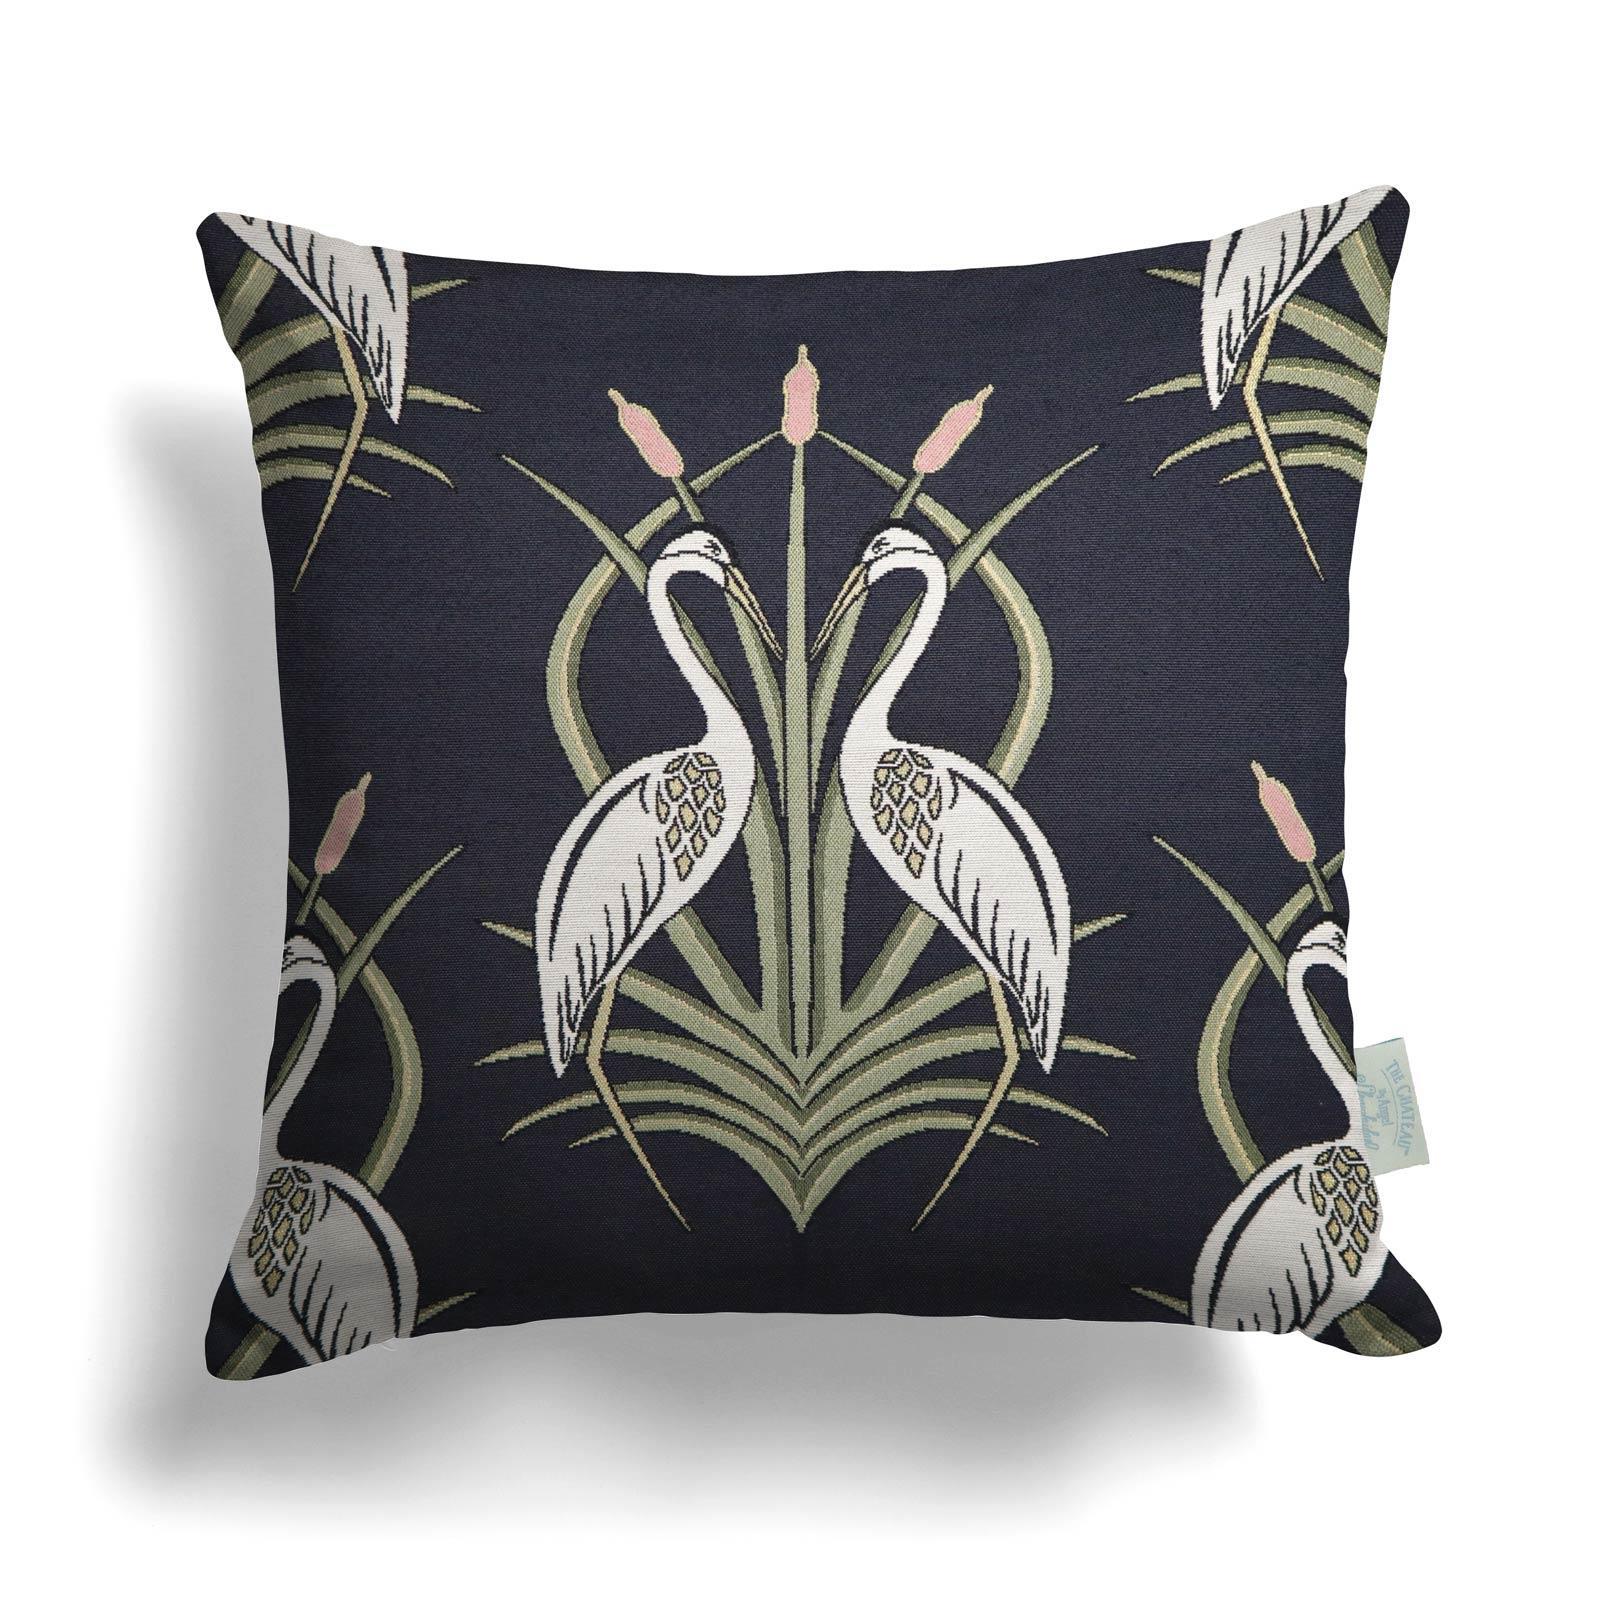 The Chateau Angel Strawbridge Potagerie Feather Cushion 43 43